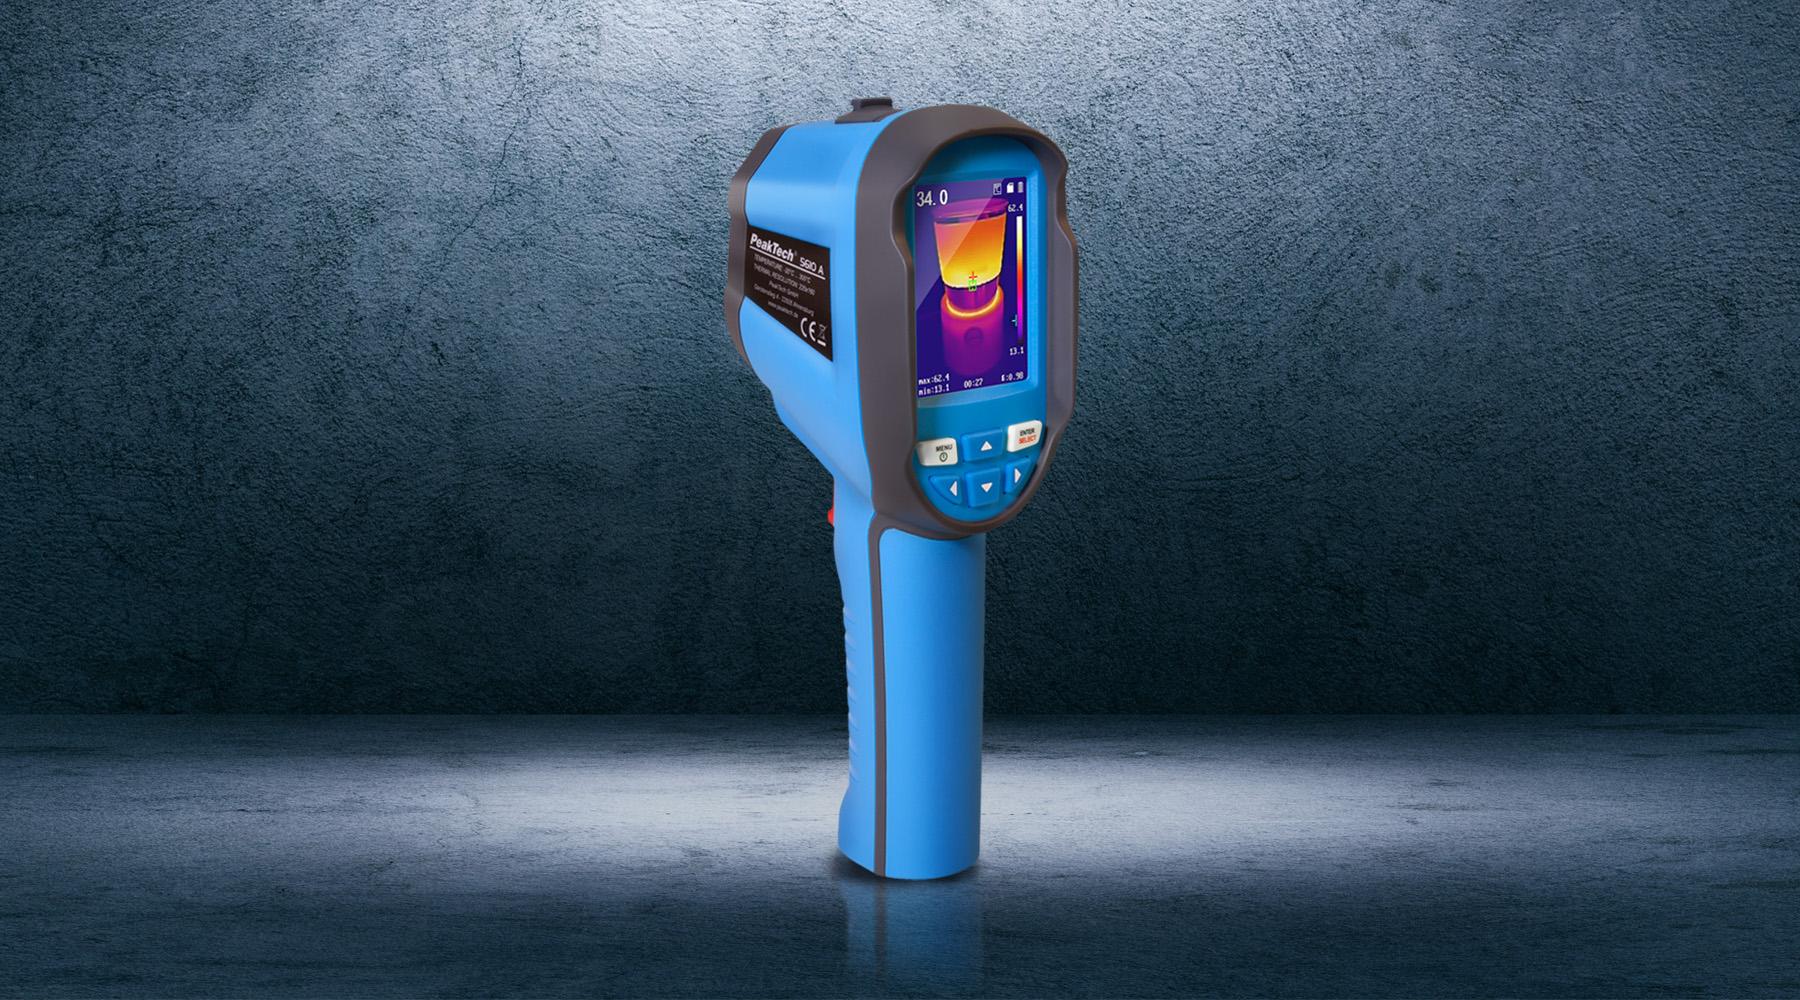 Basic thermal imaging cameras